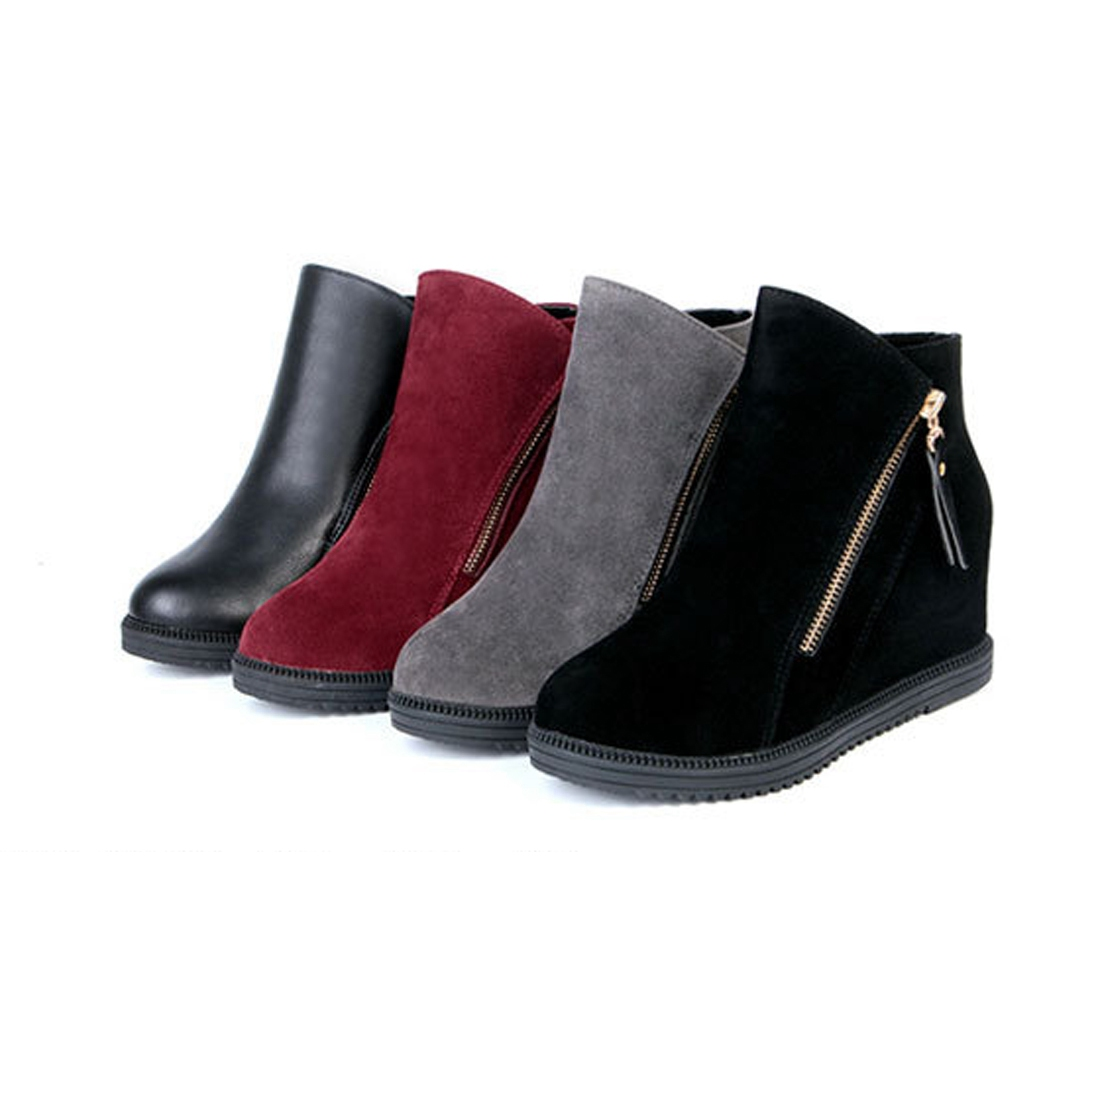 boots wedge concealed heel high top platform